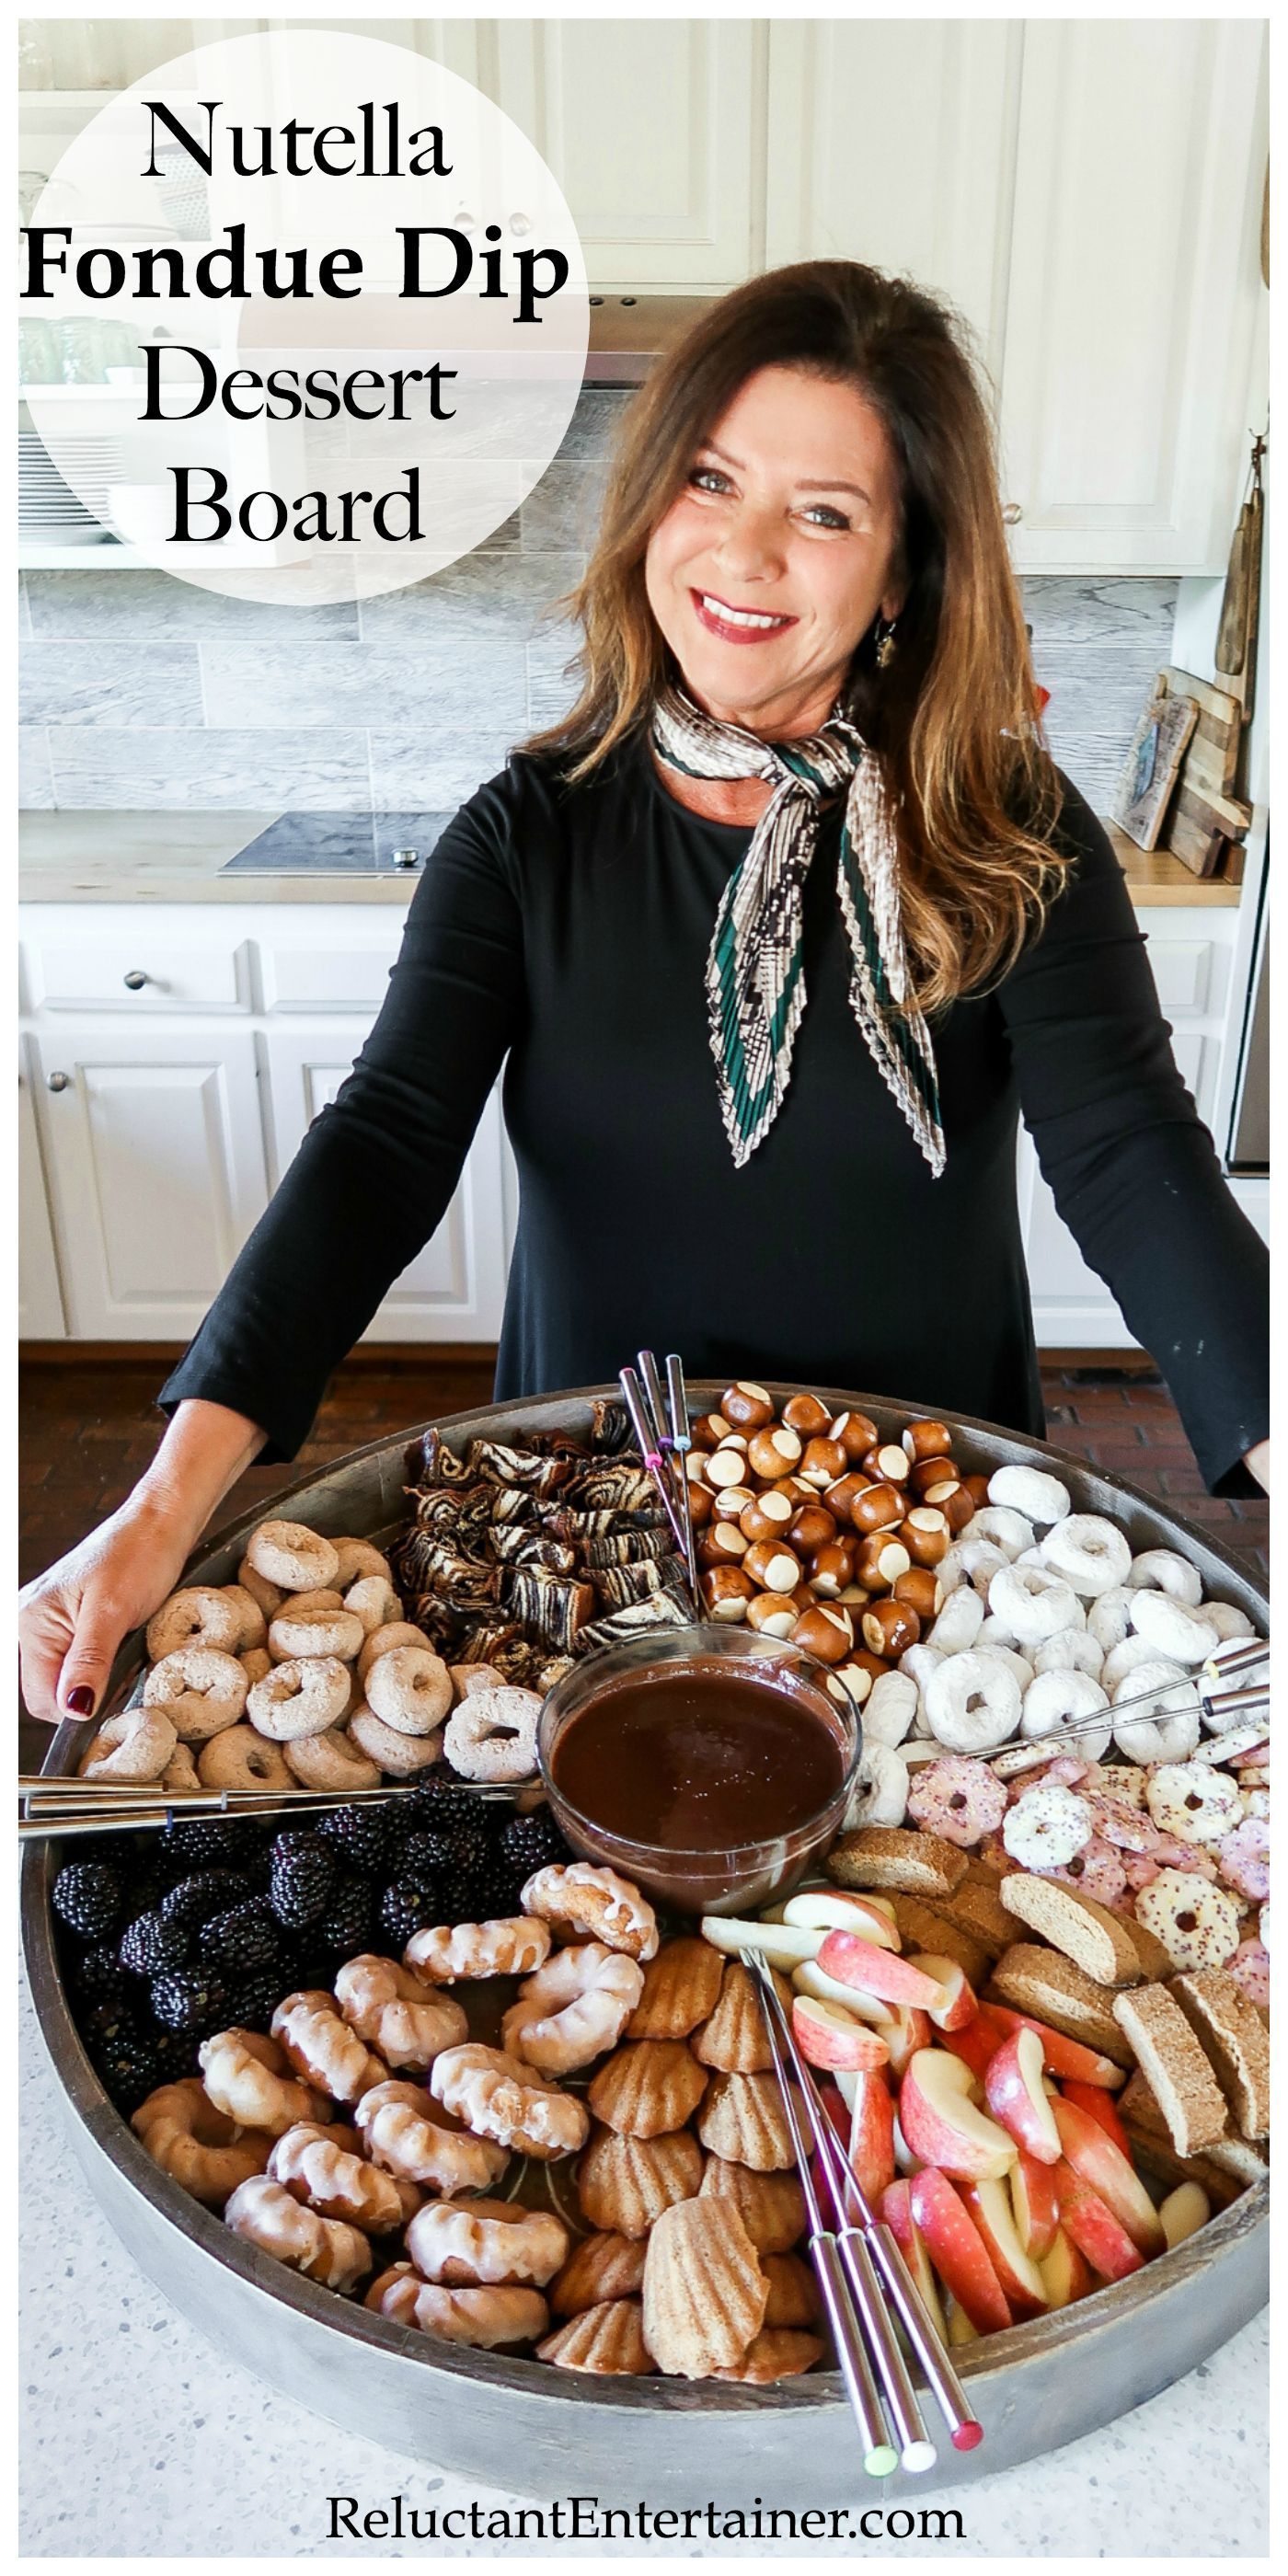 Nutella Fondue Dip Dessert Board - Reluctant Entertainer